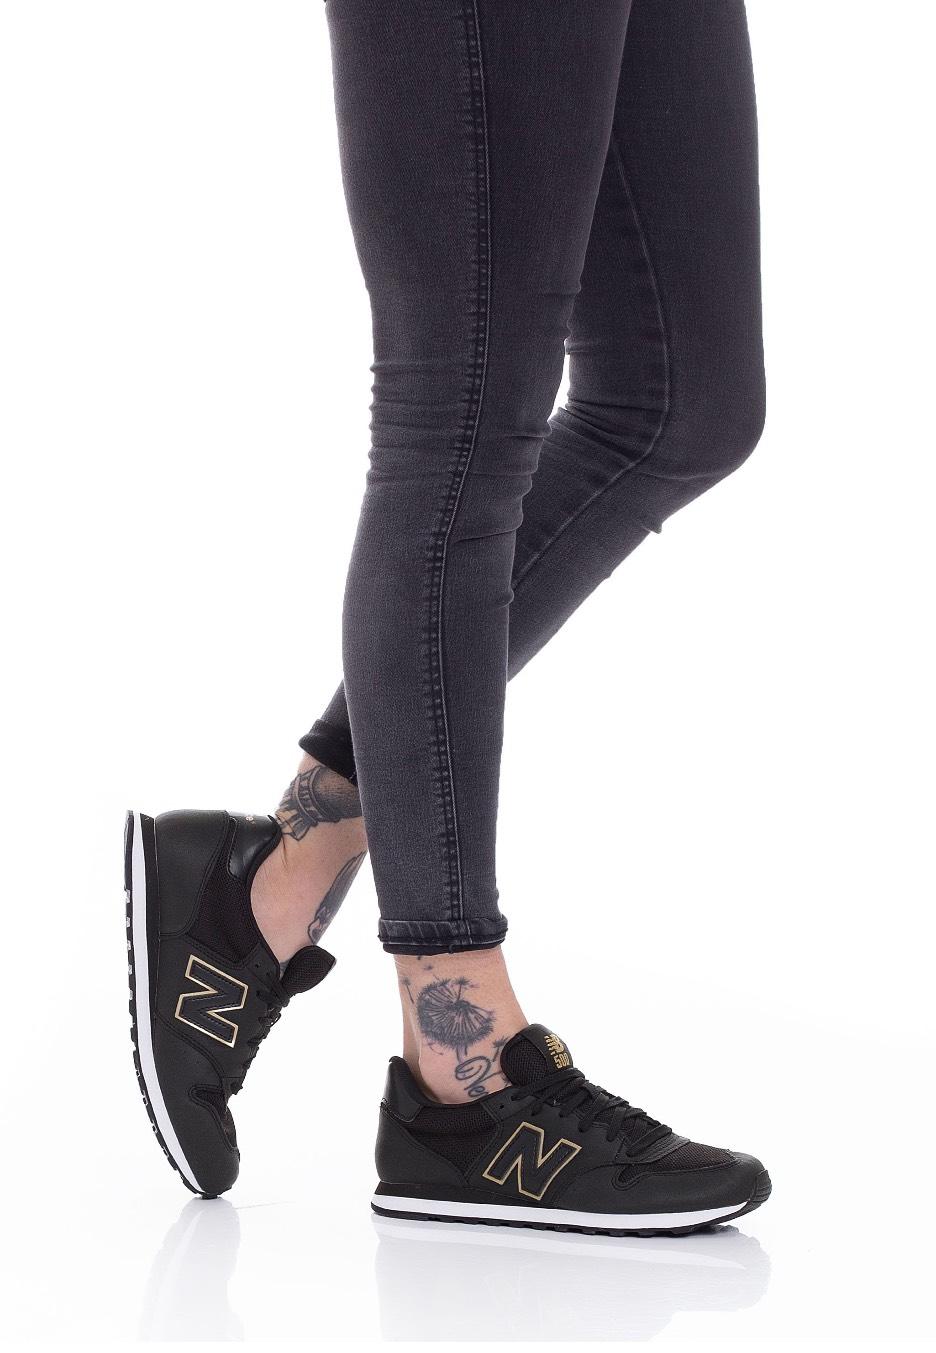 New Balance - GW500 B KGK Black/Gold - Girl Shoes - Impericon.com ...